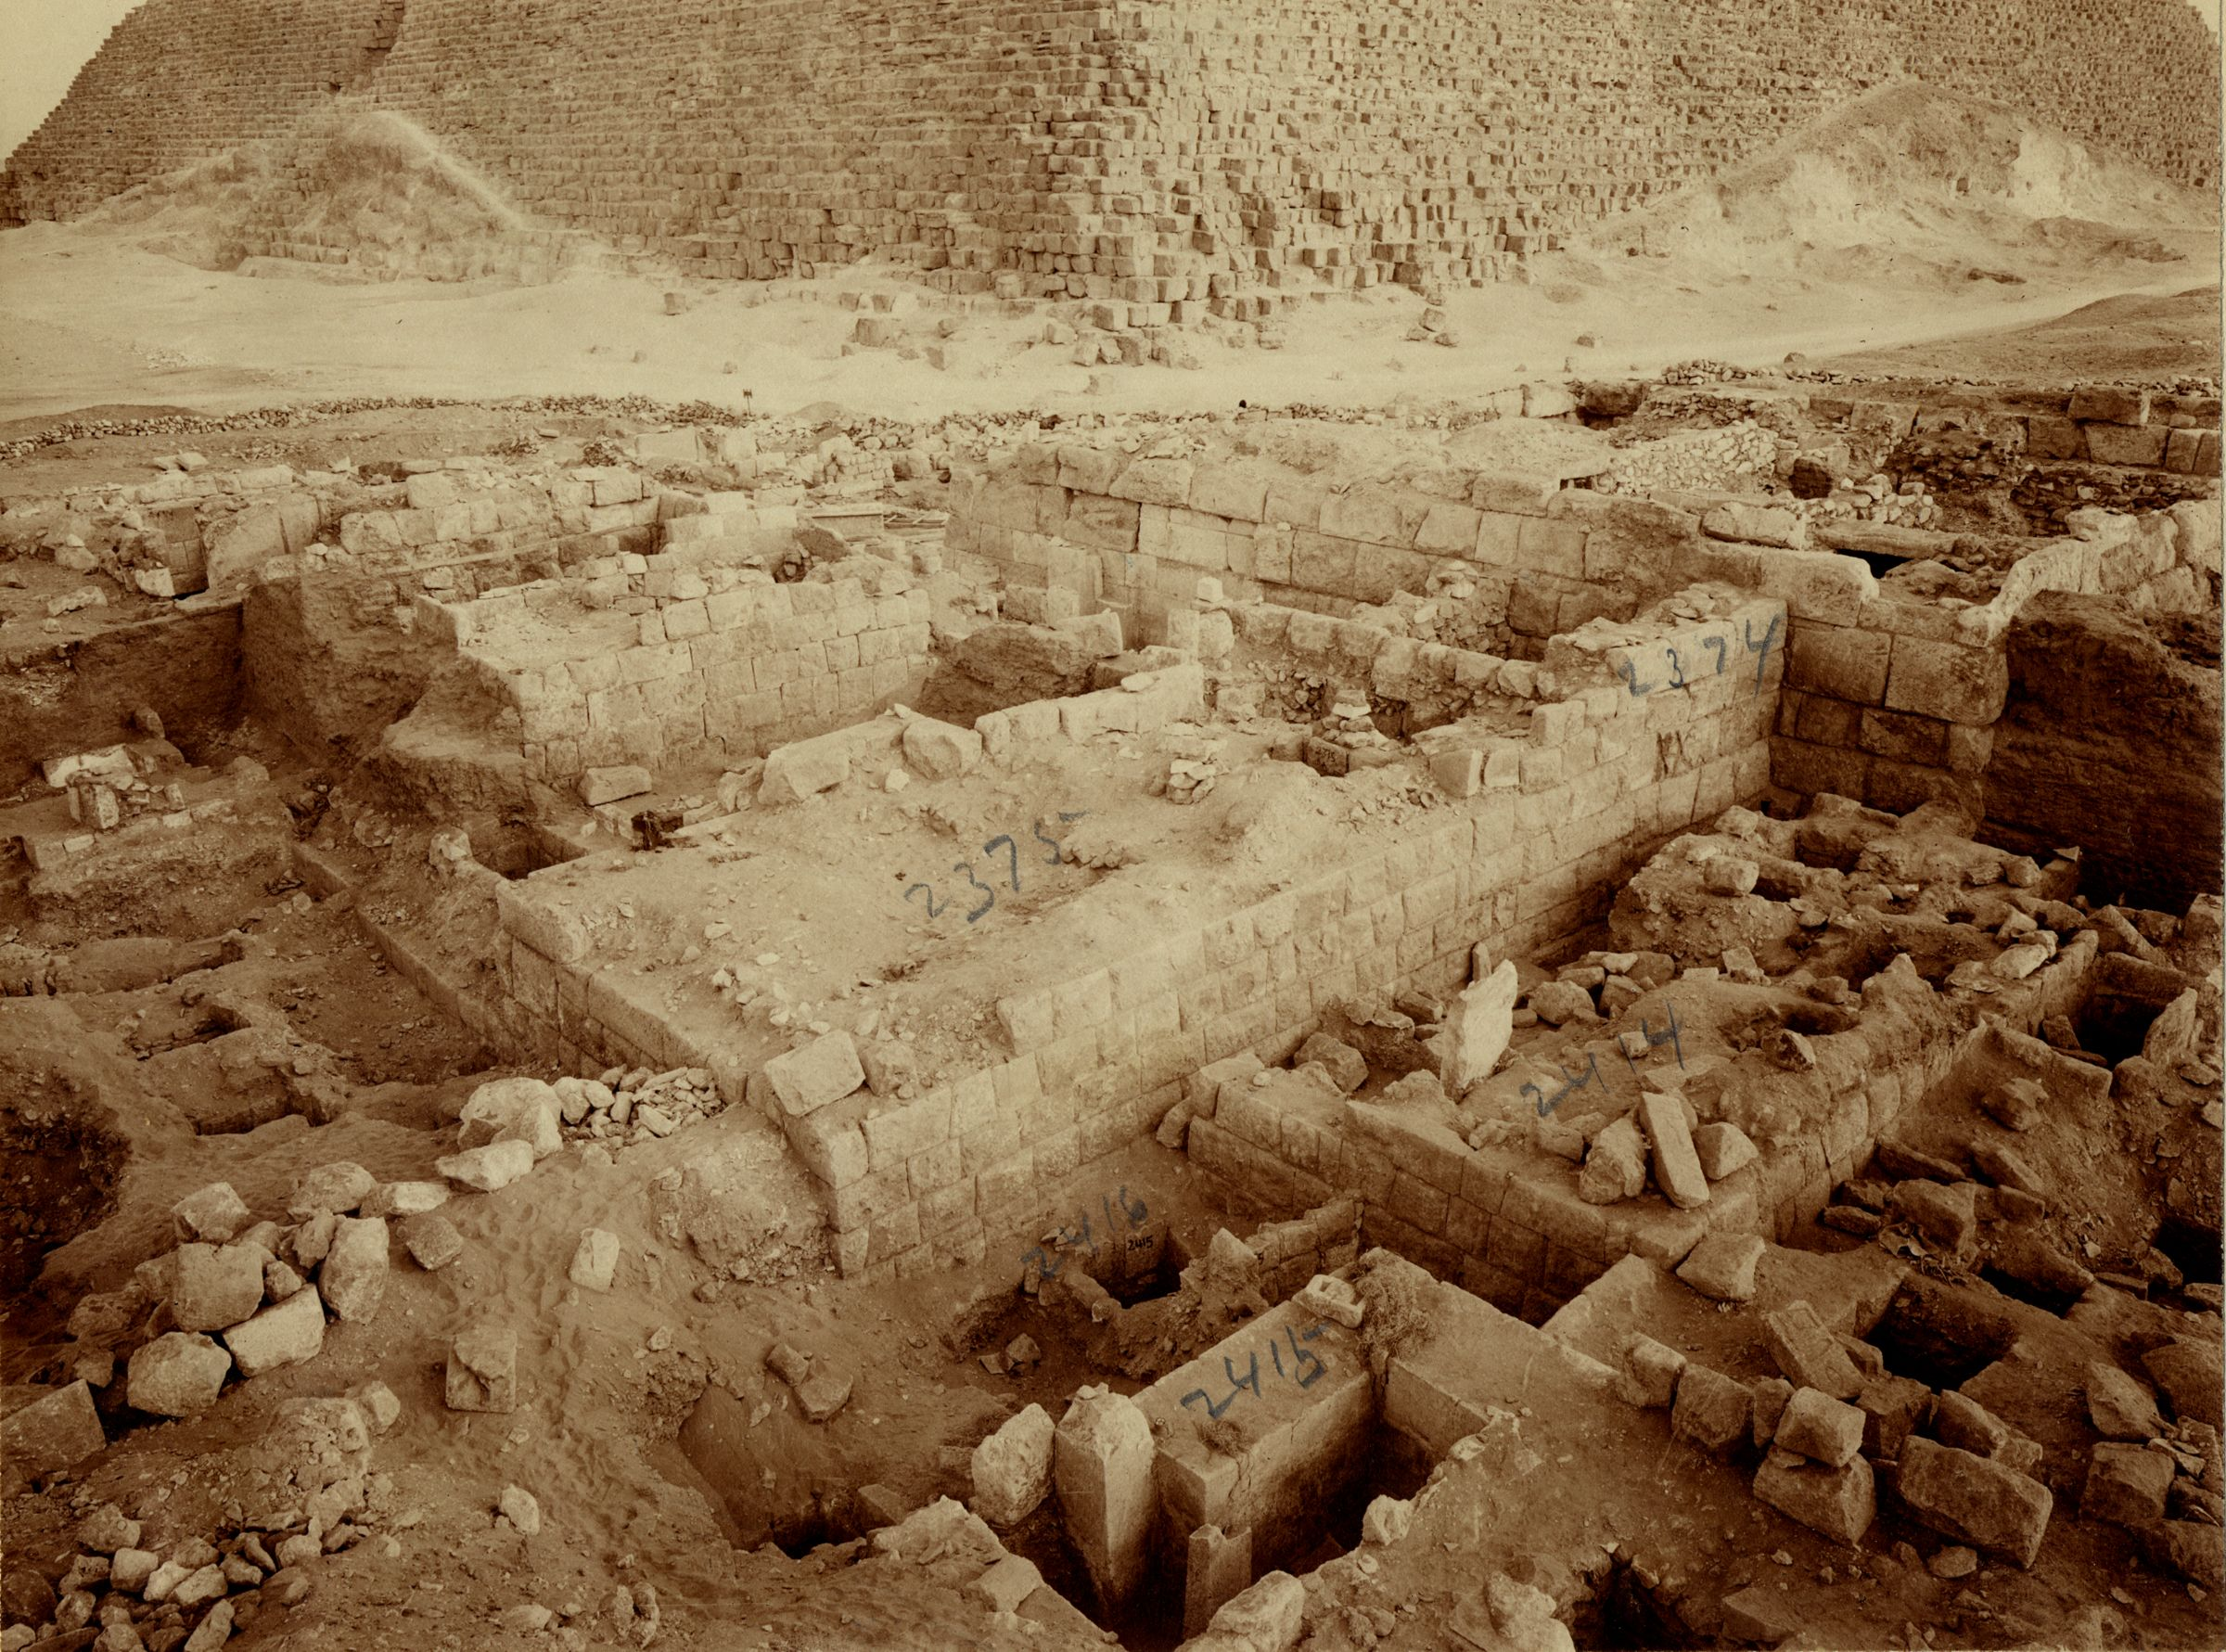 Western Cemetery: Site: Giza; View: G 2375, G 2374, G 2417, G 2415, G 2414, G 2413